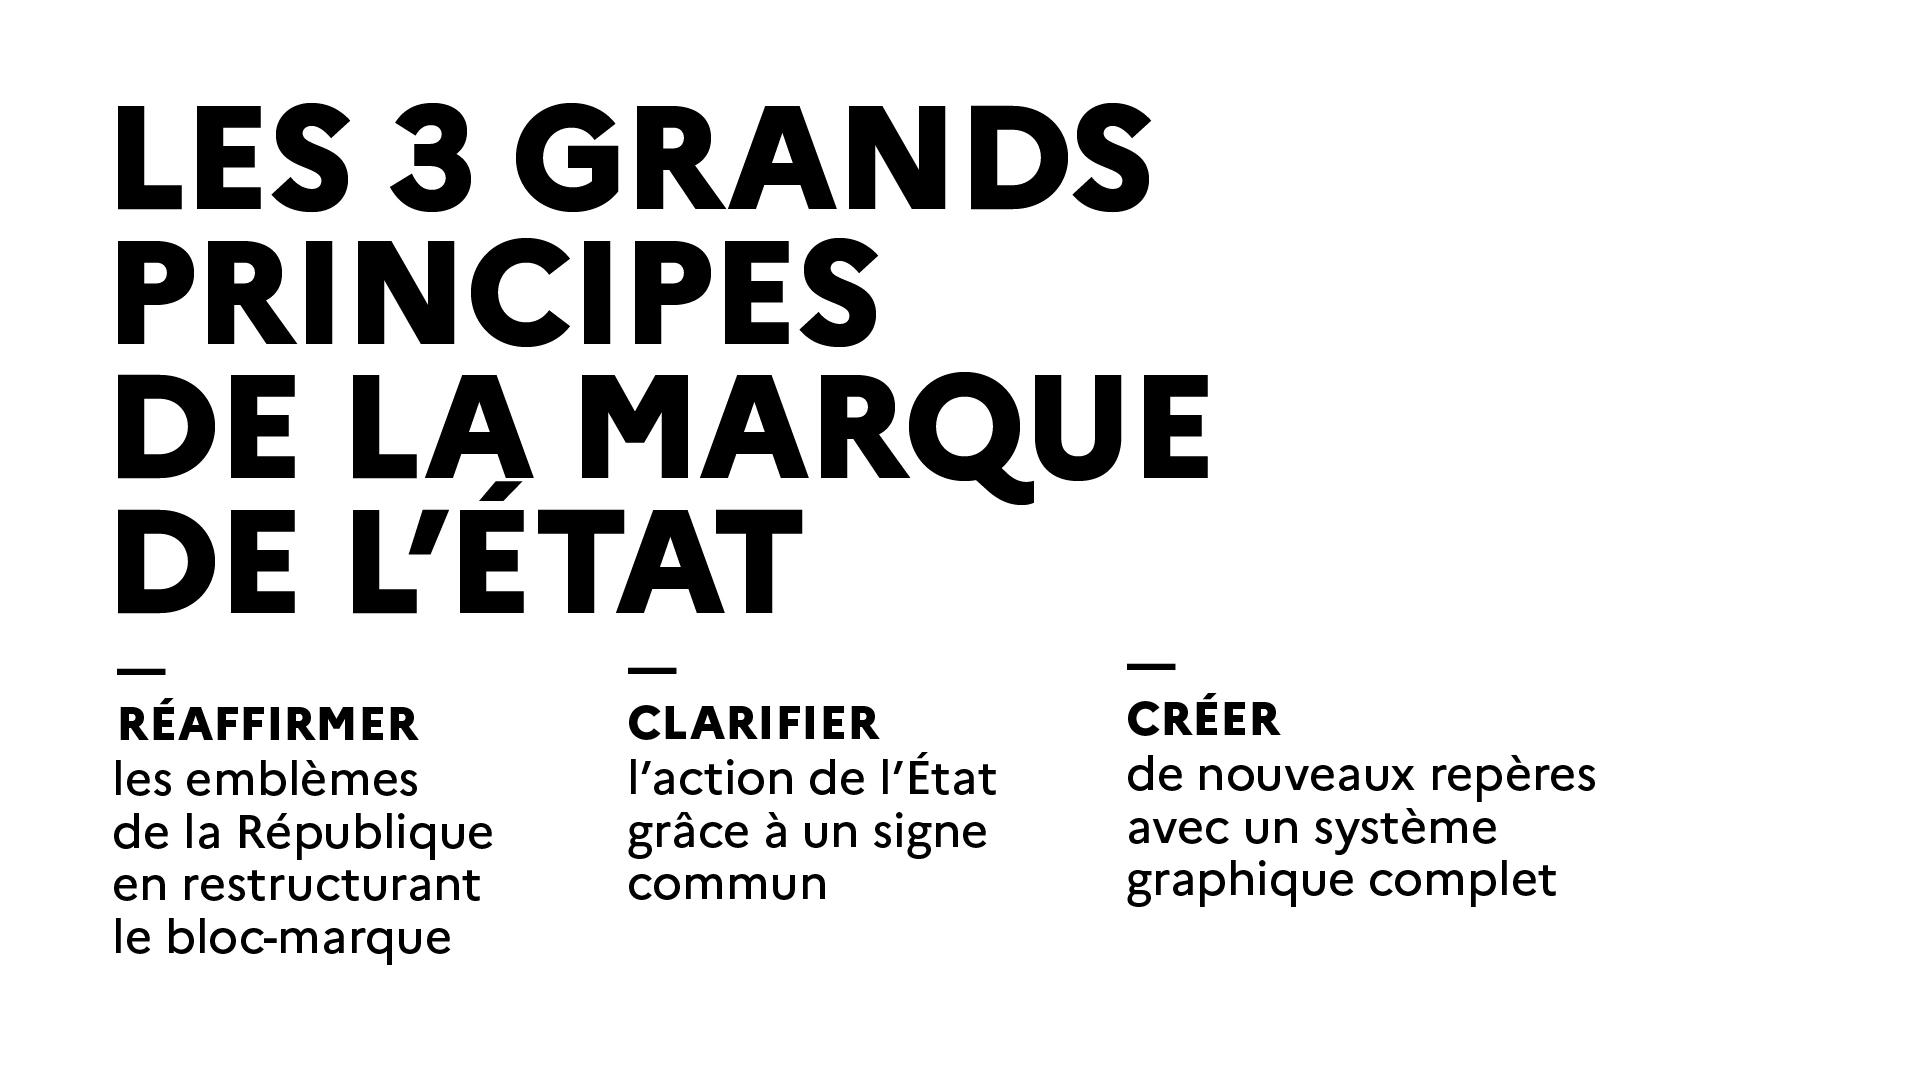 Les 3 grands principes de la marque de l'État : Réaffirmer, Clarifier, Créer